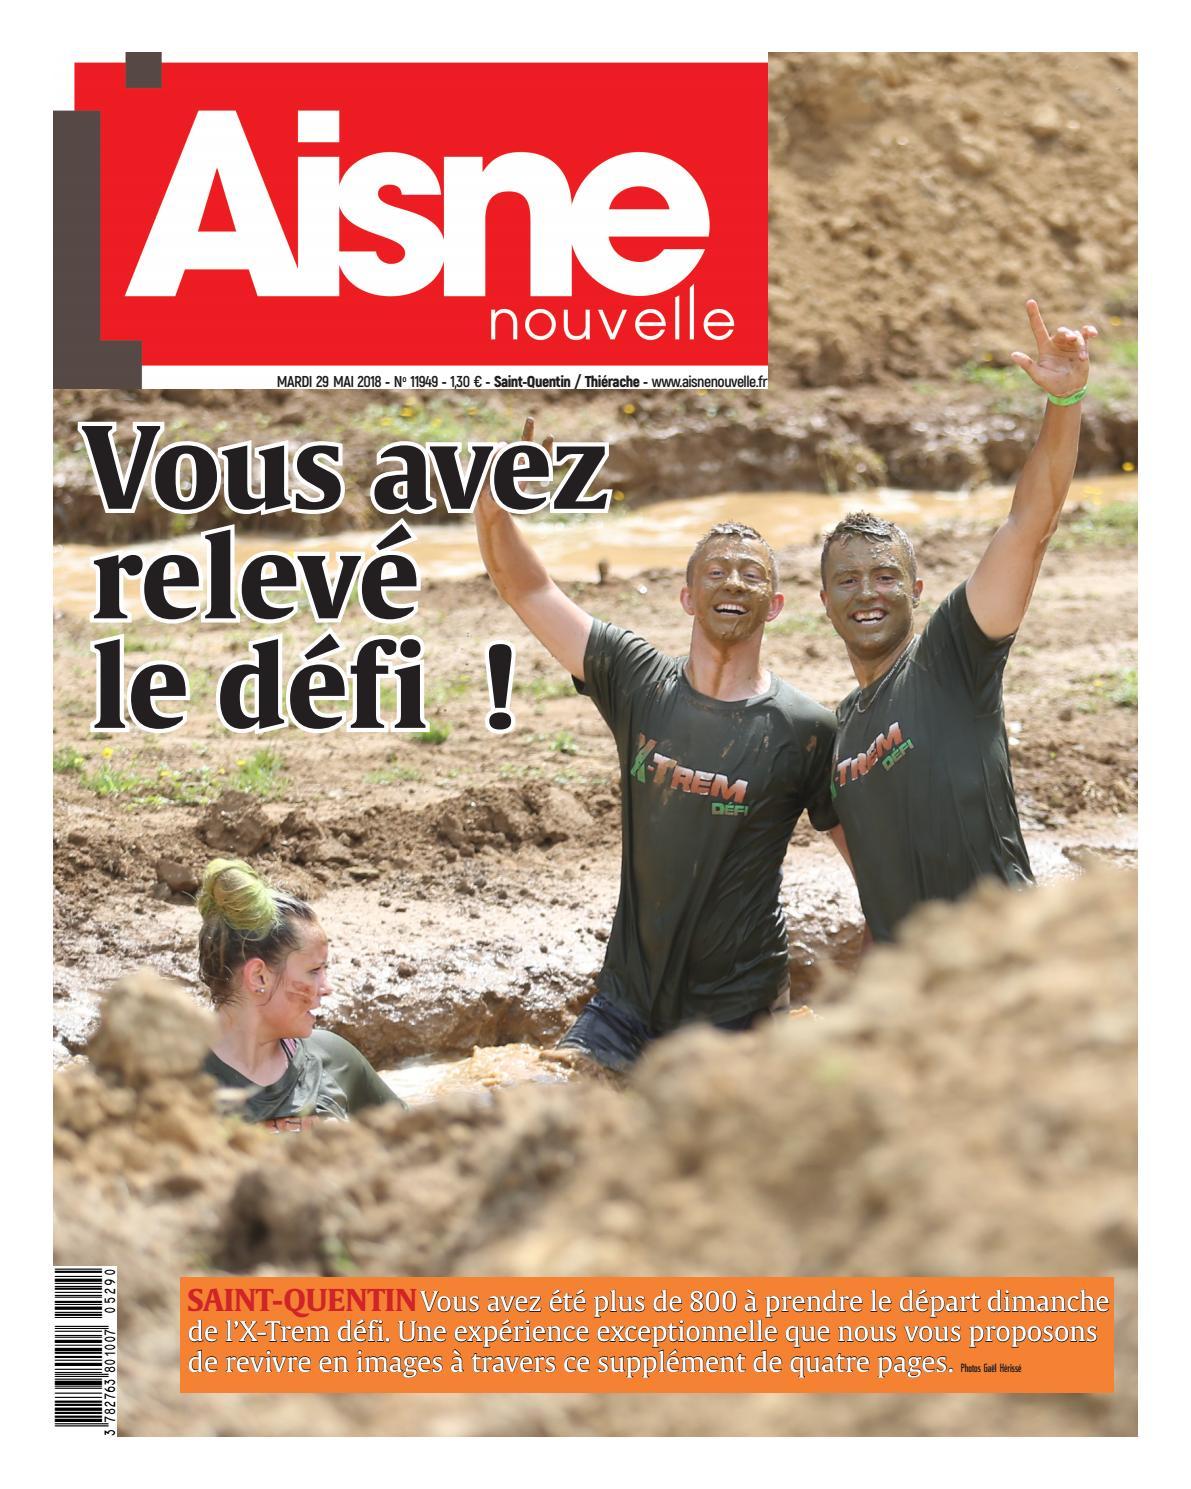 Brocante Moy De L Aisne 20180529 xtremdefi anvdn - issuu